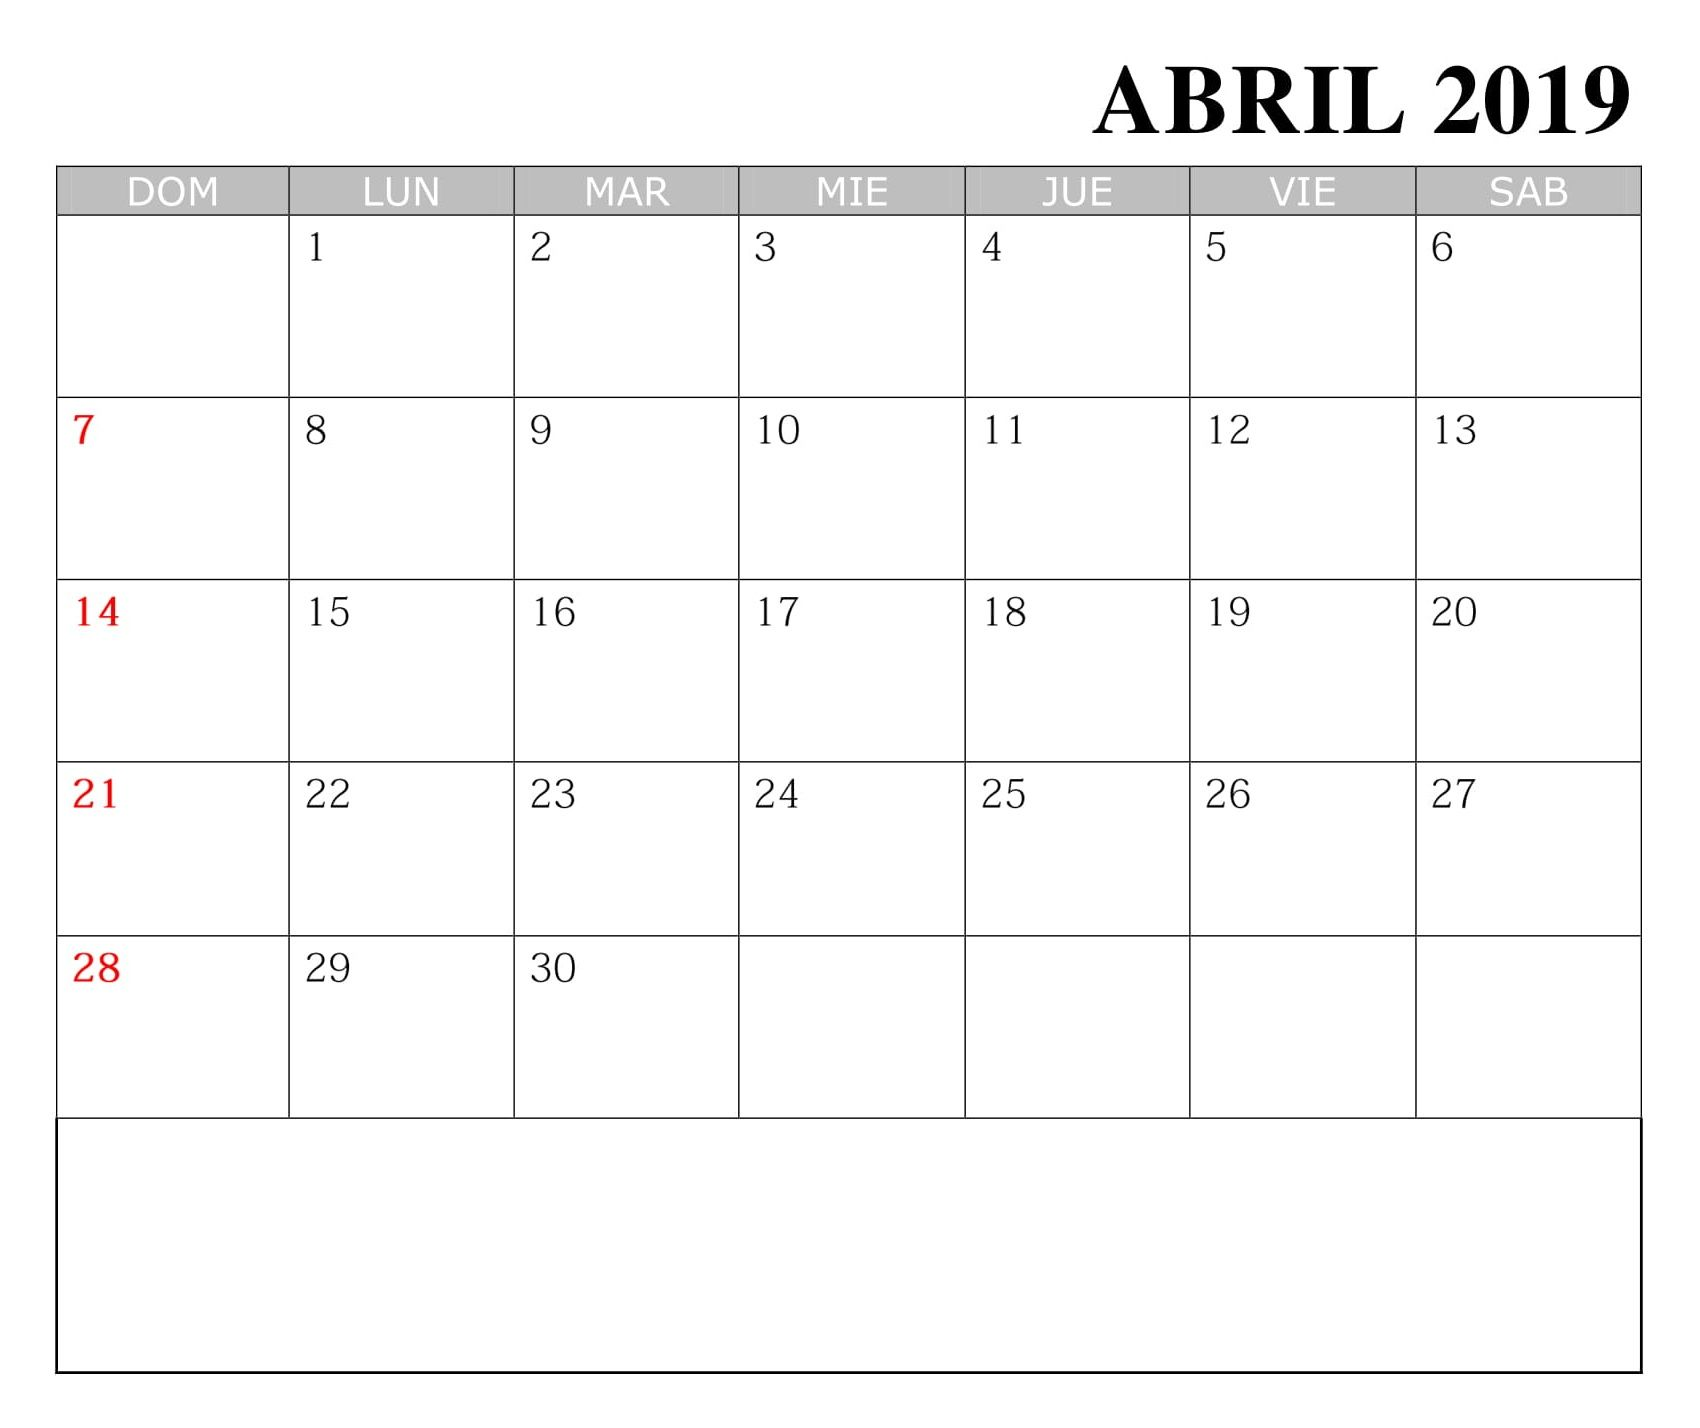 Calendario Imprimir Abril 2019.Calendario Abril